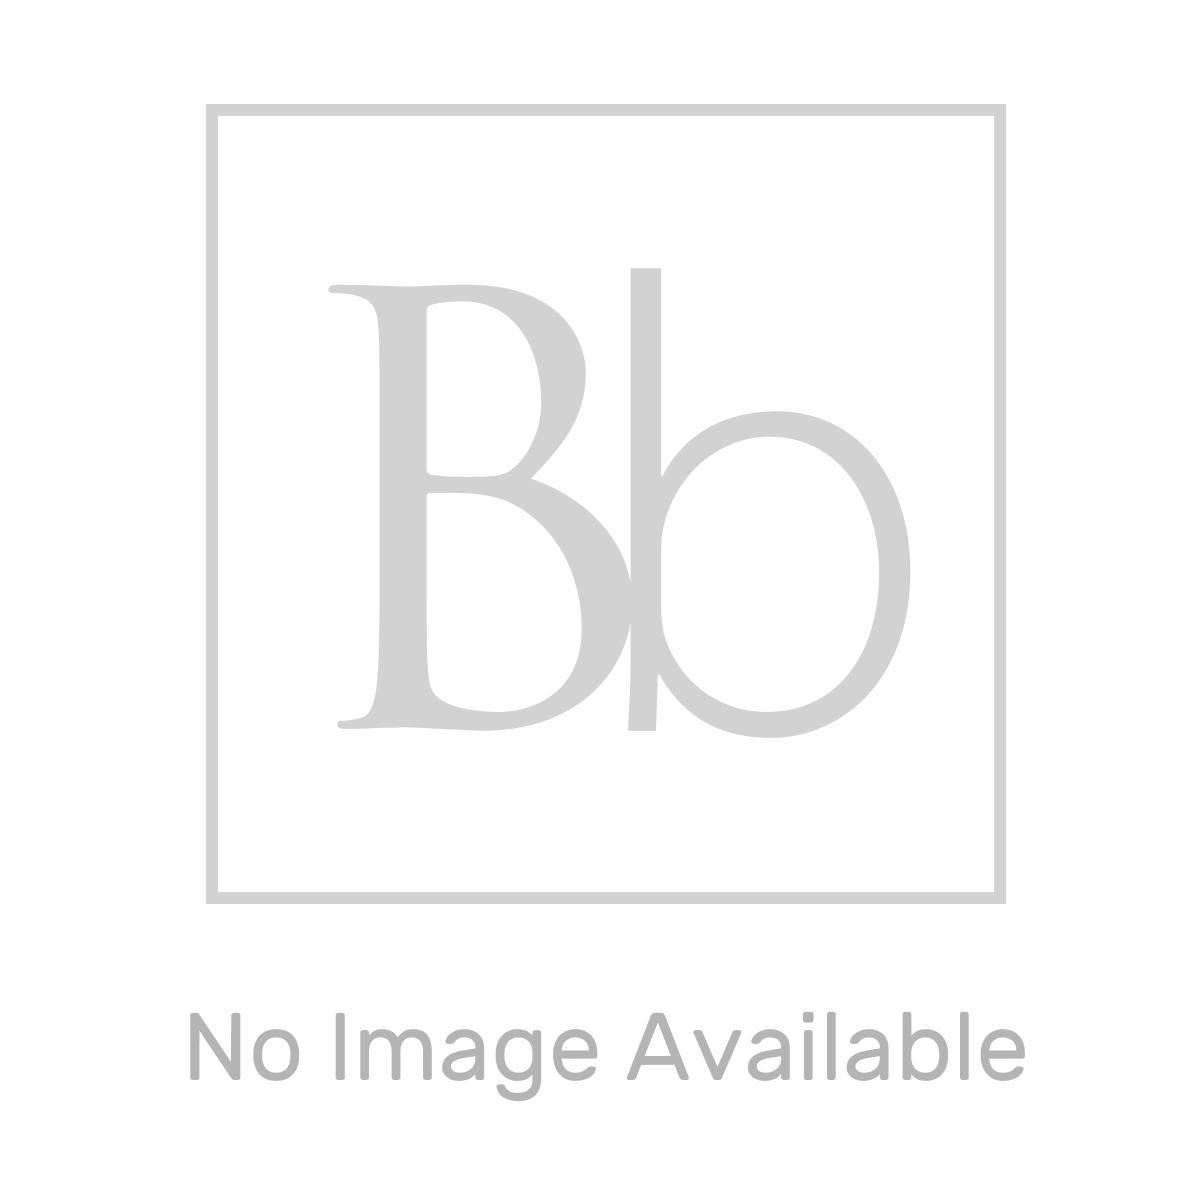 Moods Plain White Deluxe Acrylic Bath End Panel 700 / 750mm